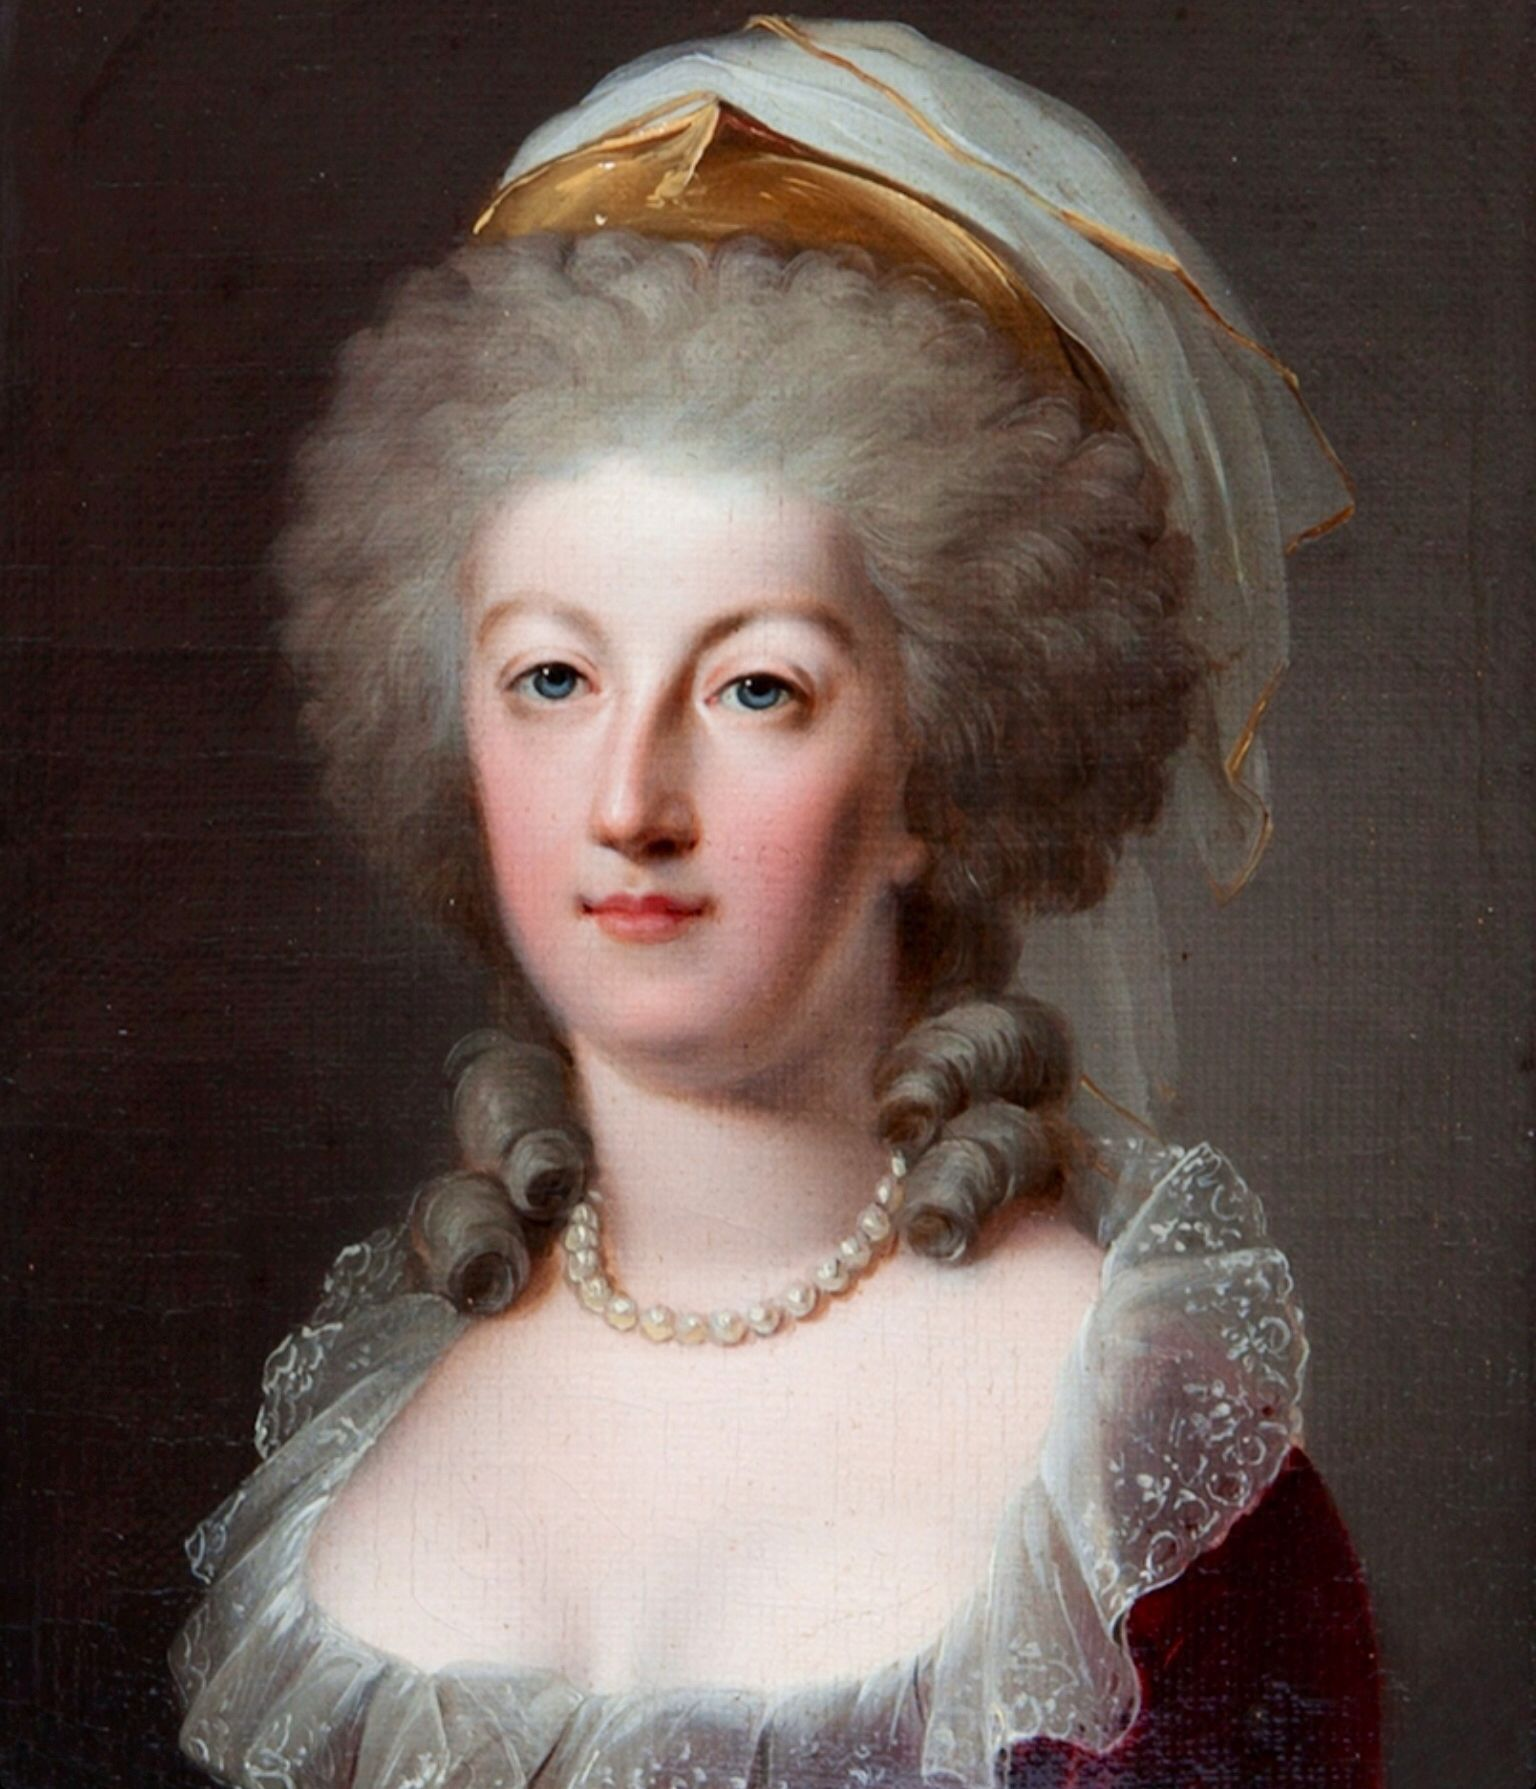 картинки французская королева нет такого